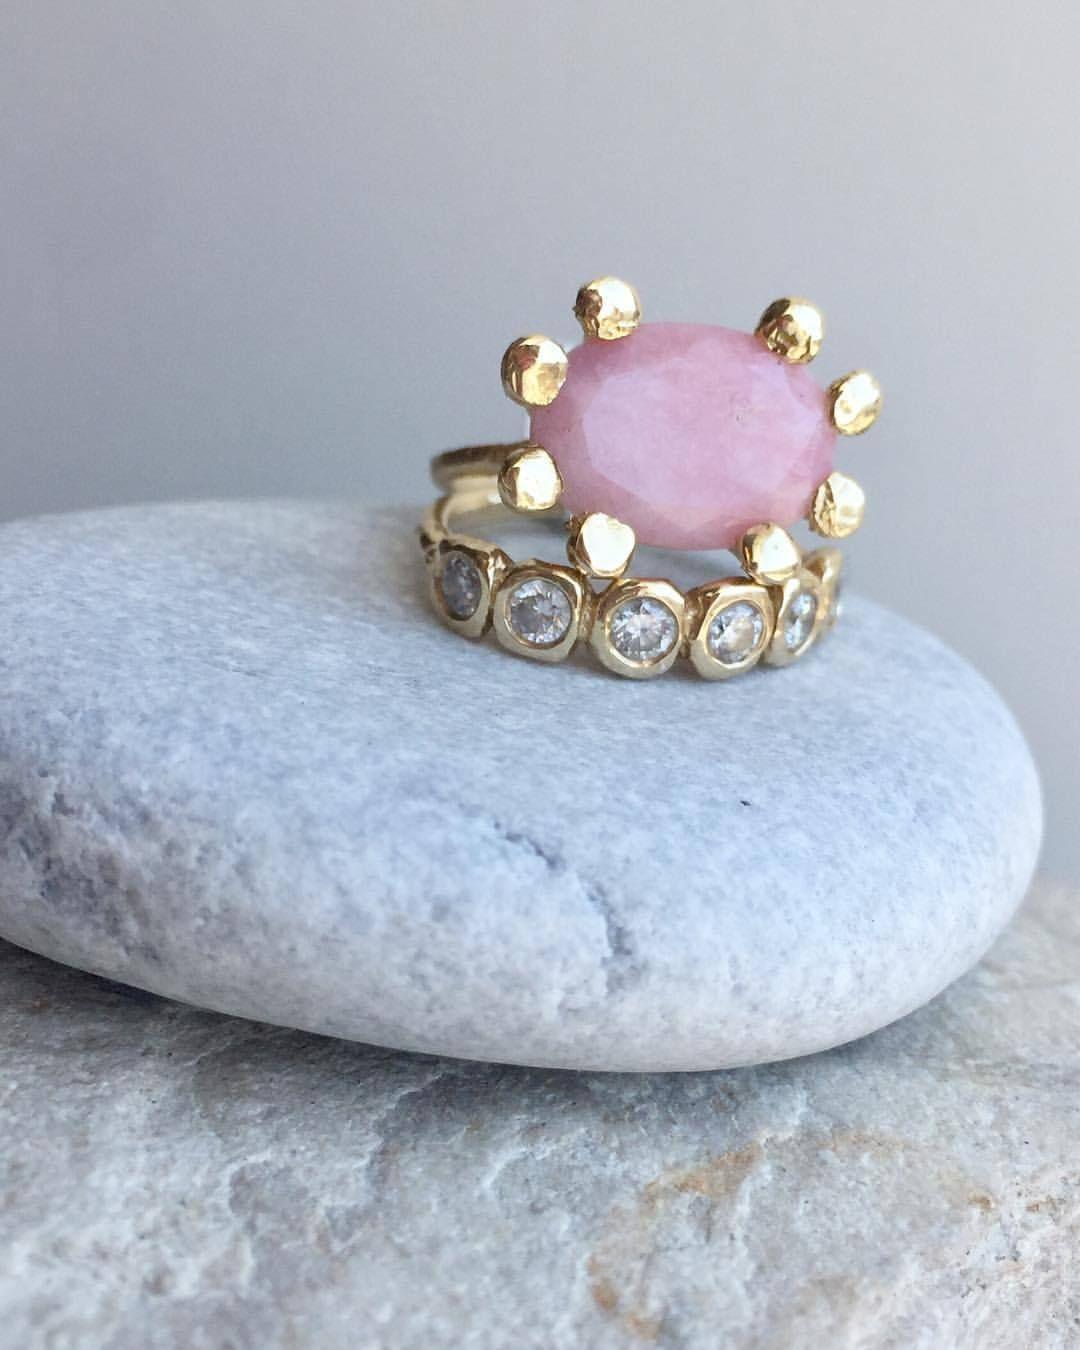 Jane pope jewelry